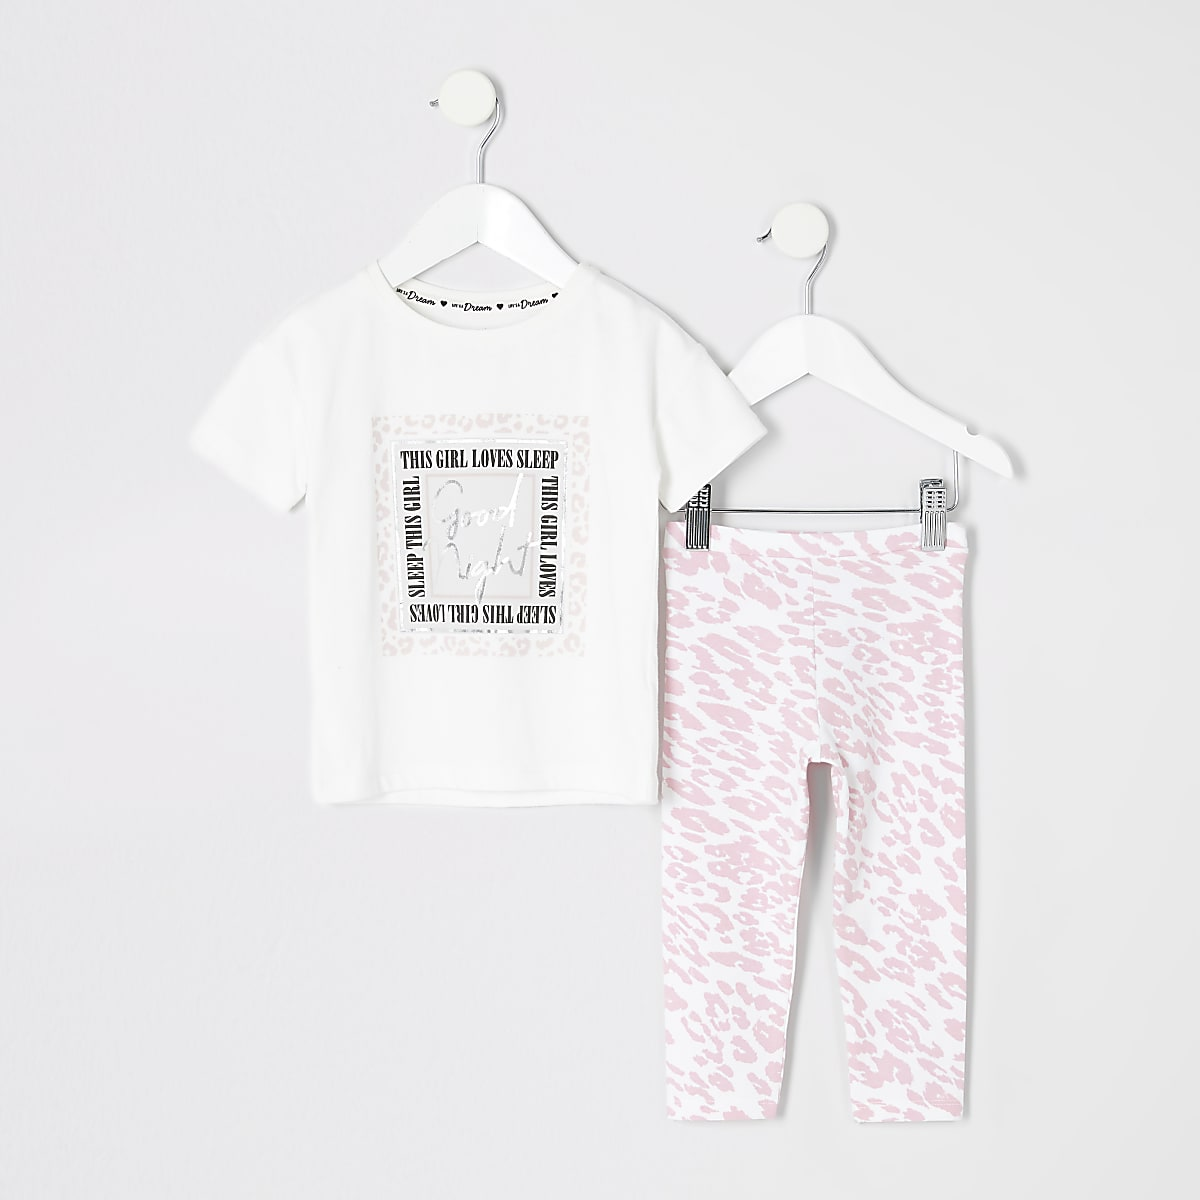 Mini girls 'girl loves sleep' pjyama set